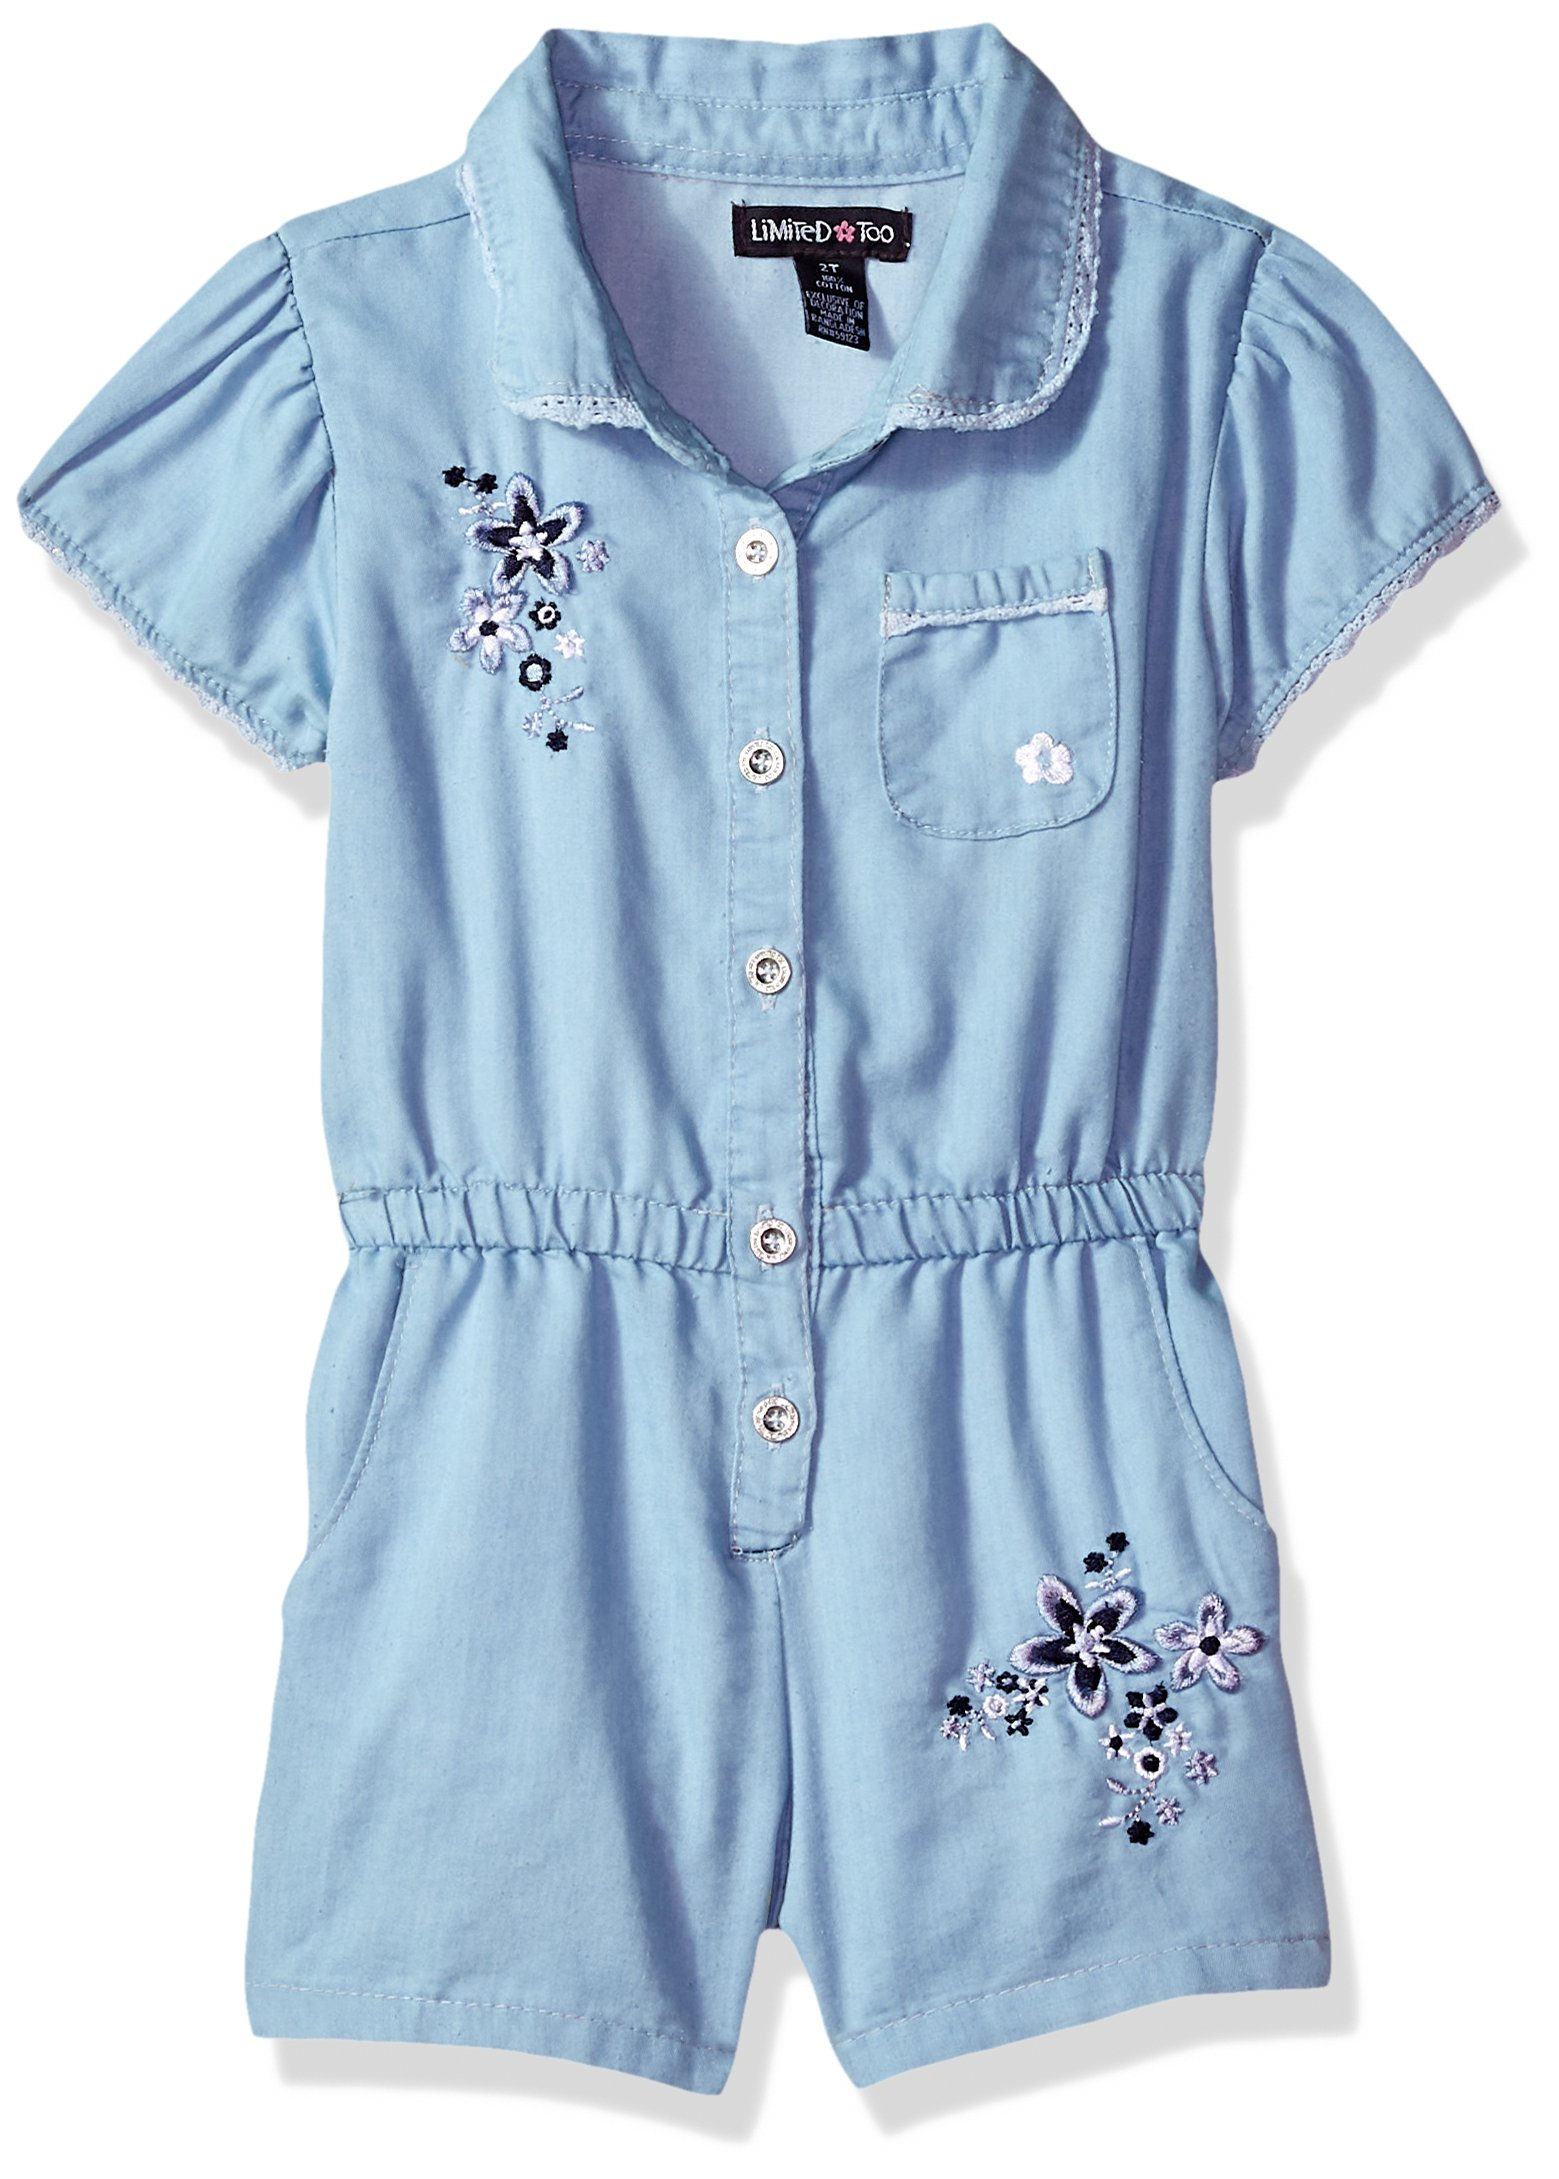 Limited Too Toddler Girls' Romper, Summer Flowers Light Blue Denim, 3T